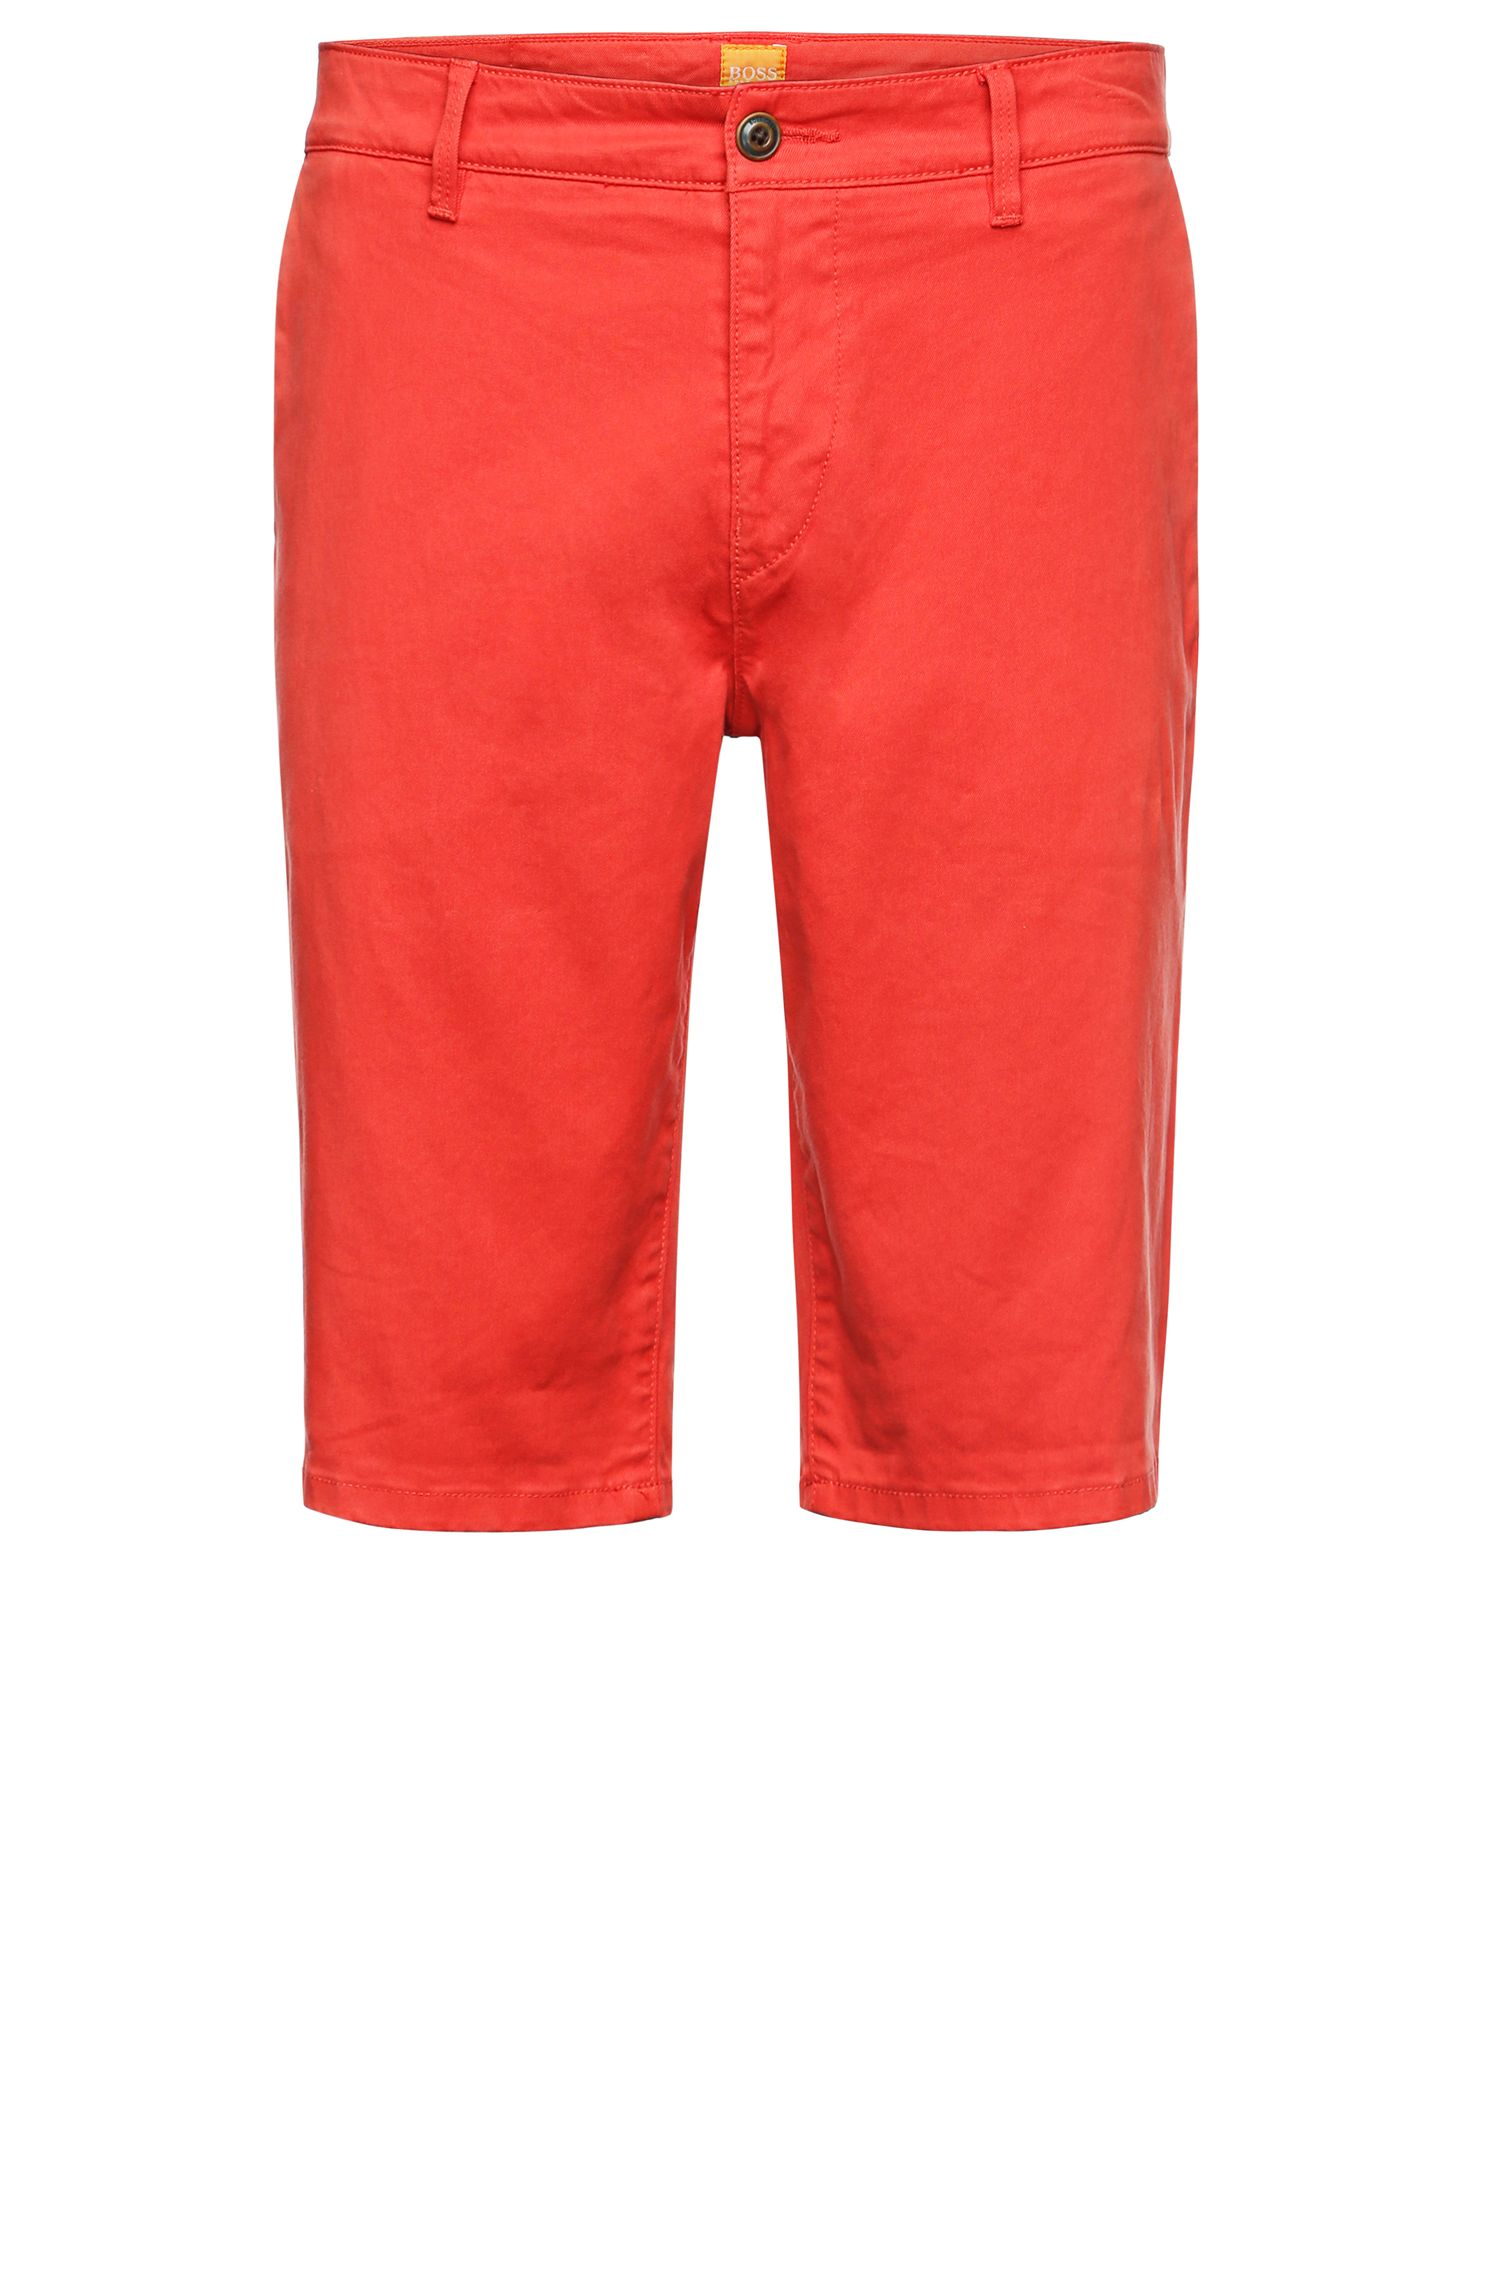 'Schino-Slim-Shorts-D' | Slim Fit, Stretch Cotton Chino Shorts